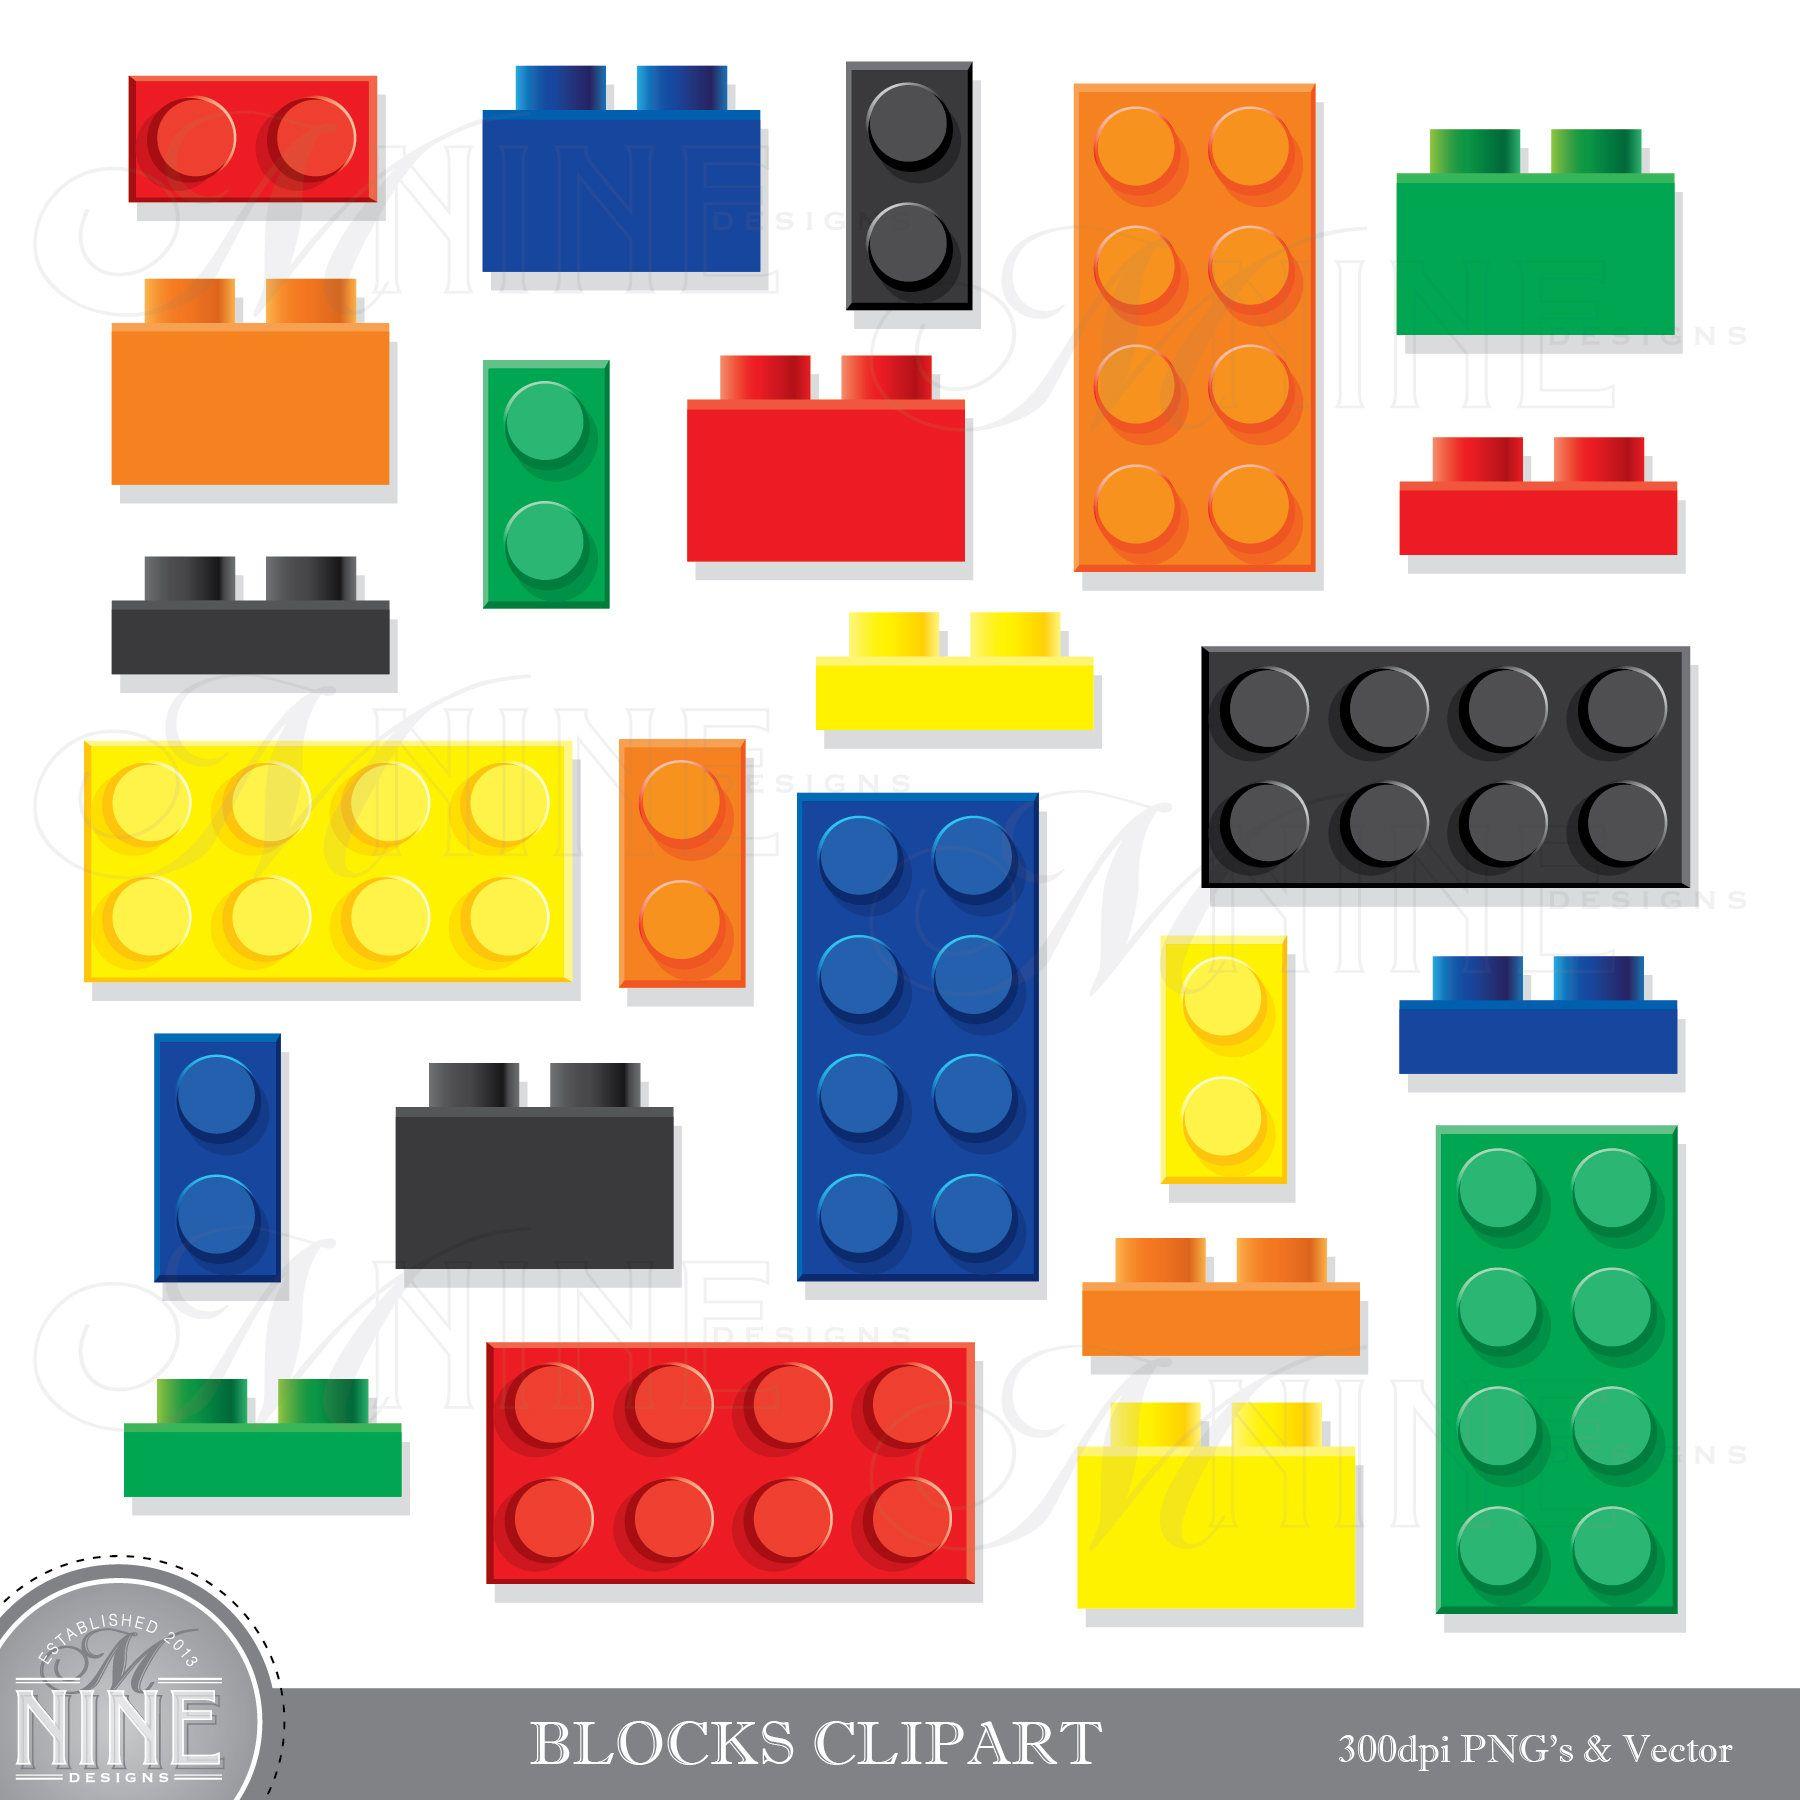 Building Blocks Clip Art Building Bricks Clipart Downloads Etsy In 2021 Clip Art Scrapbook Printing Photo Album Scrapbooking